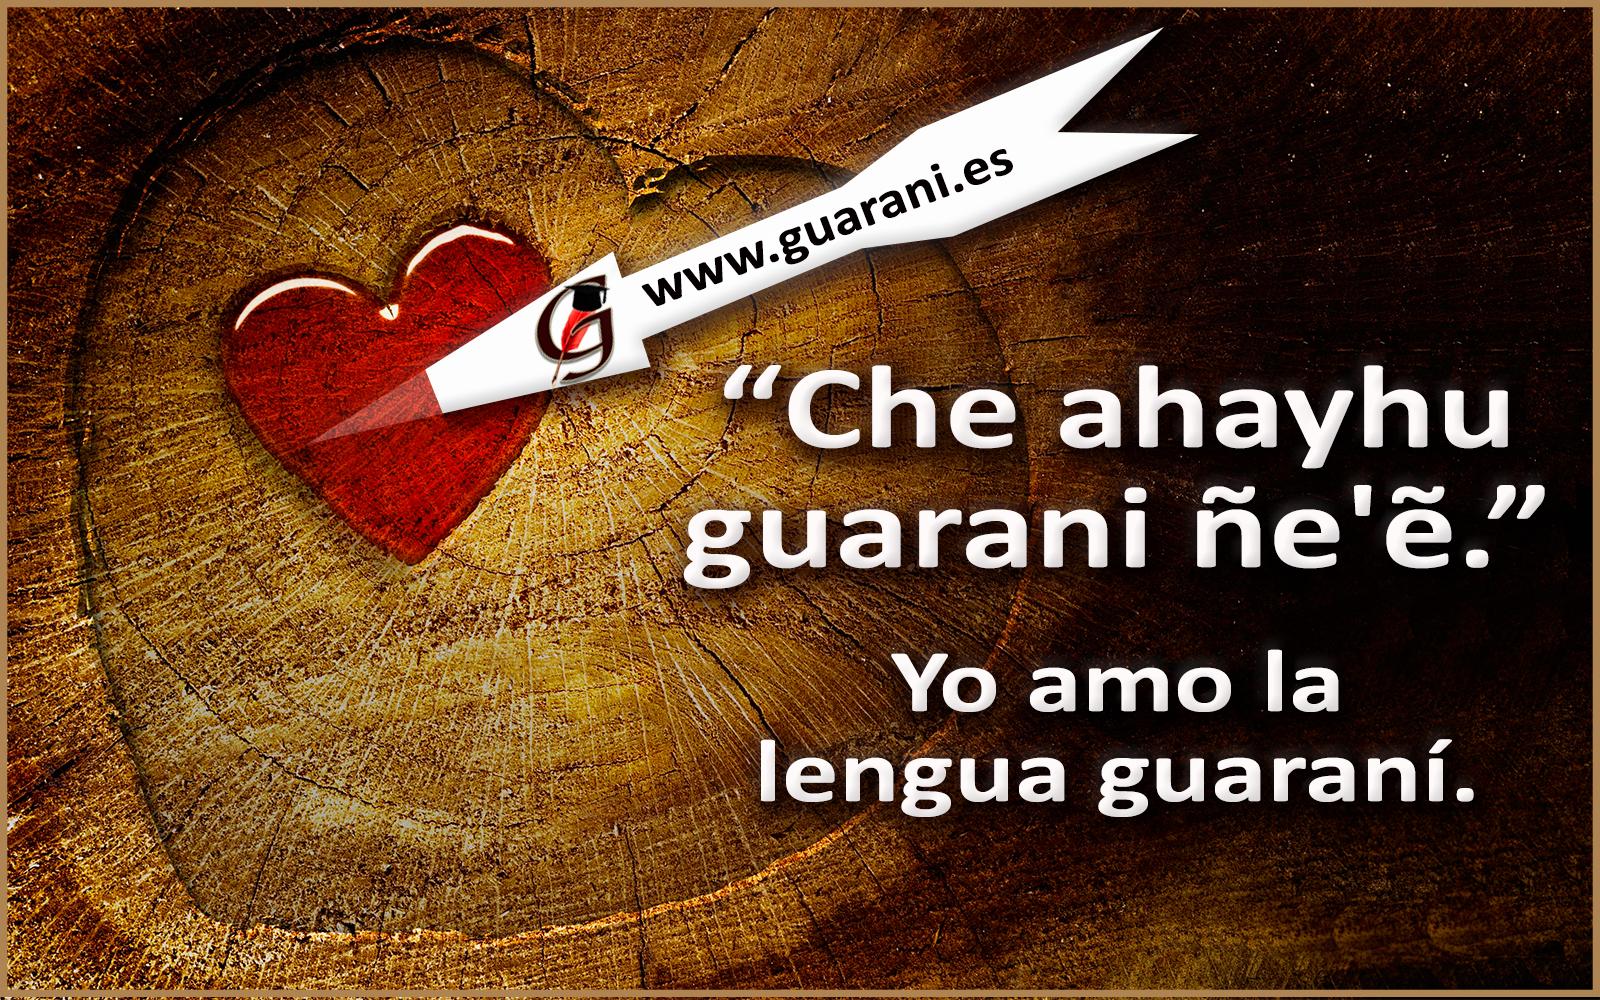 ahayhu-lengua-guaran-flecha2